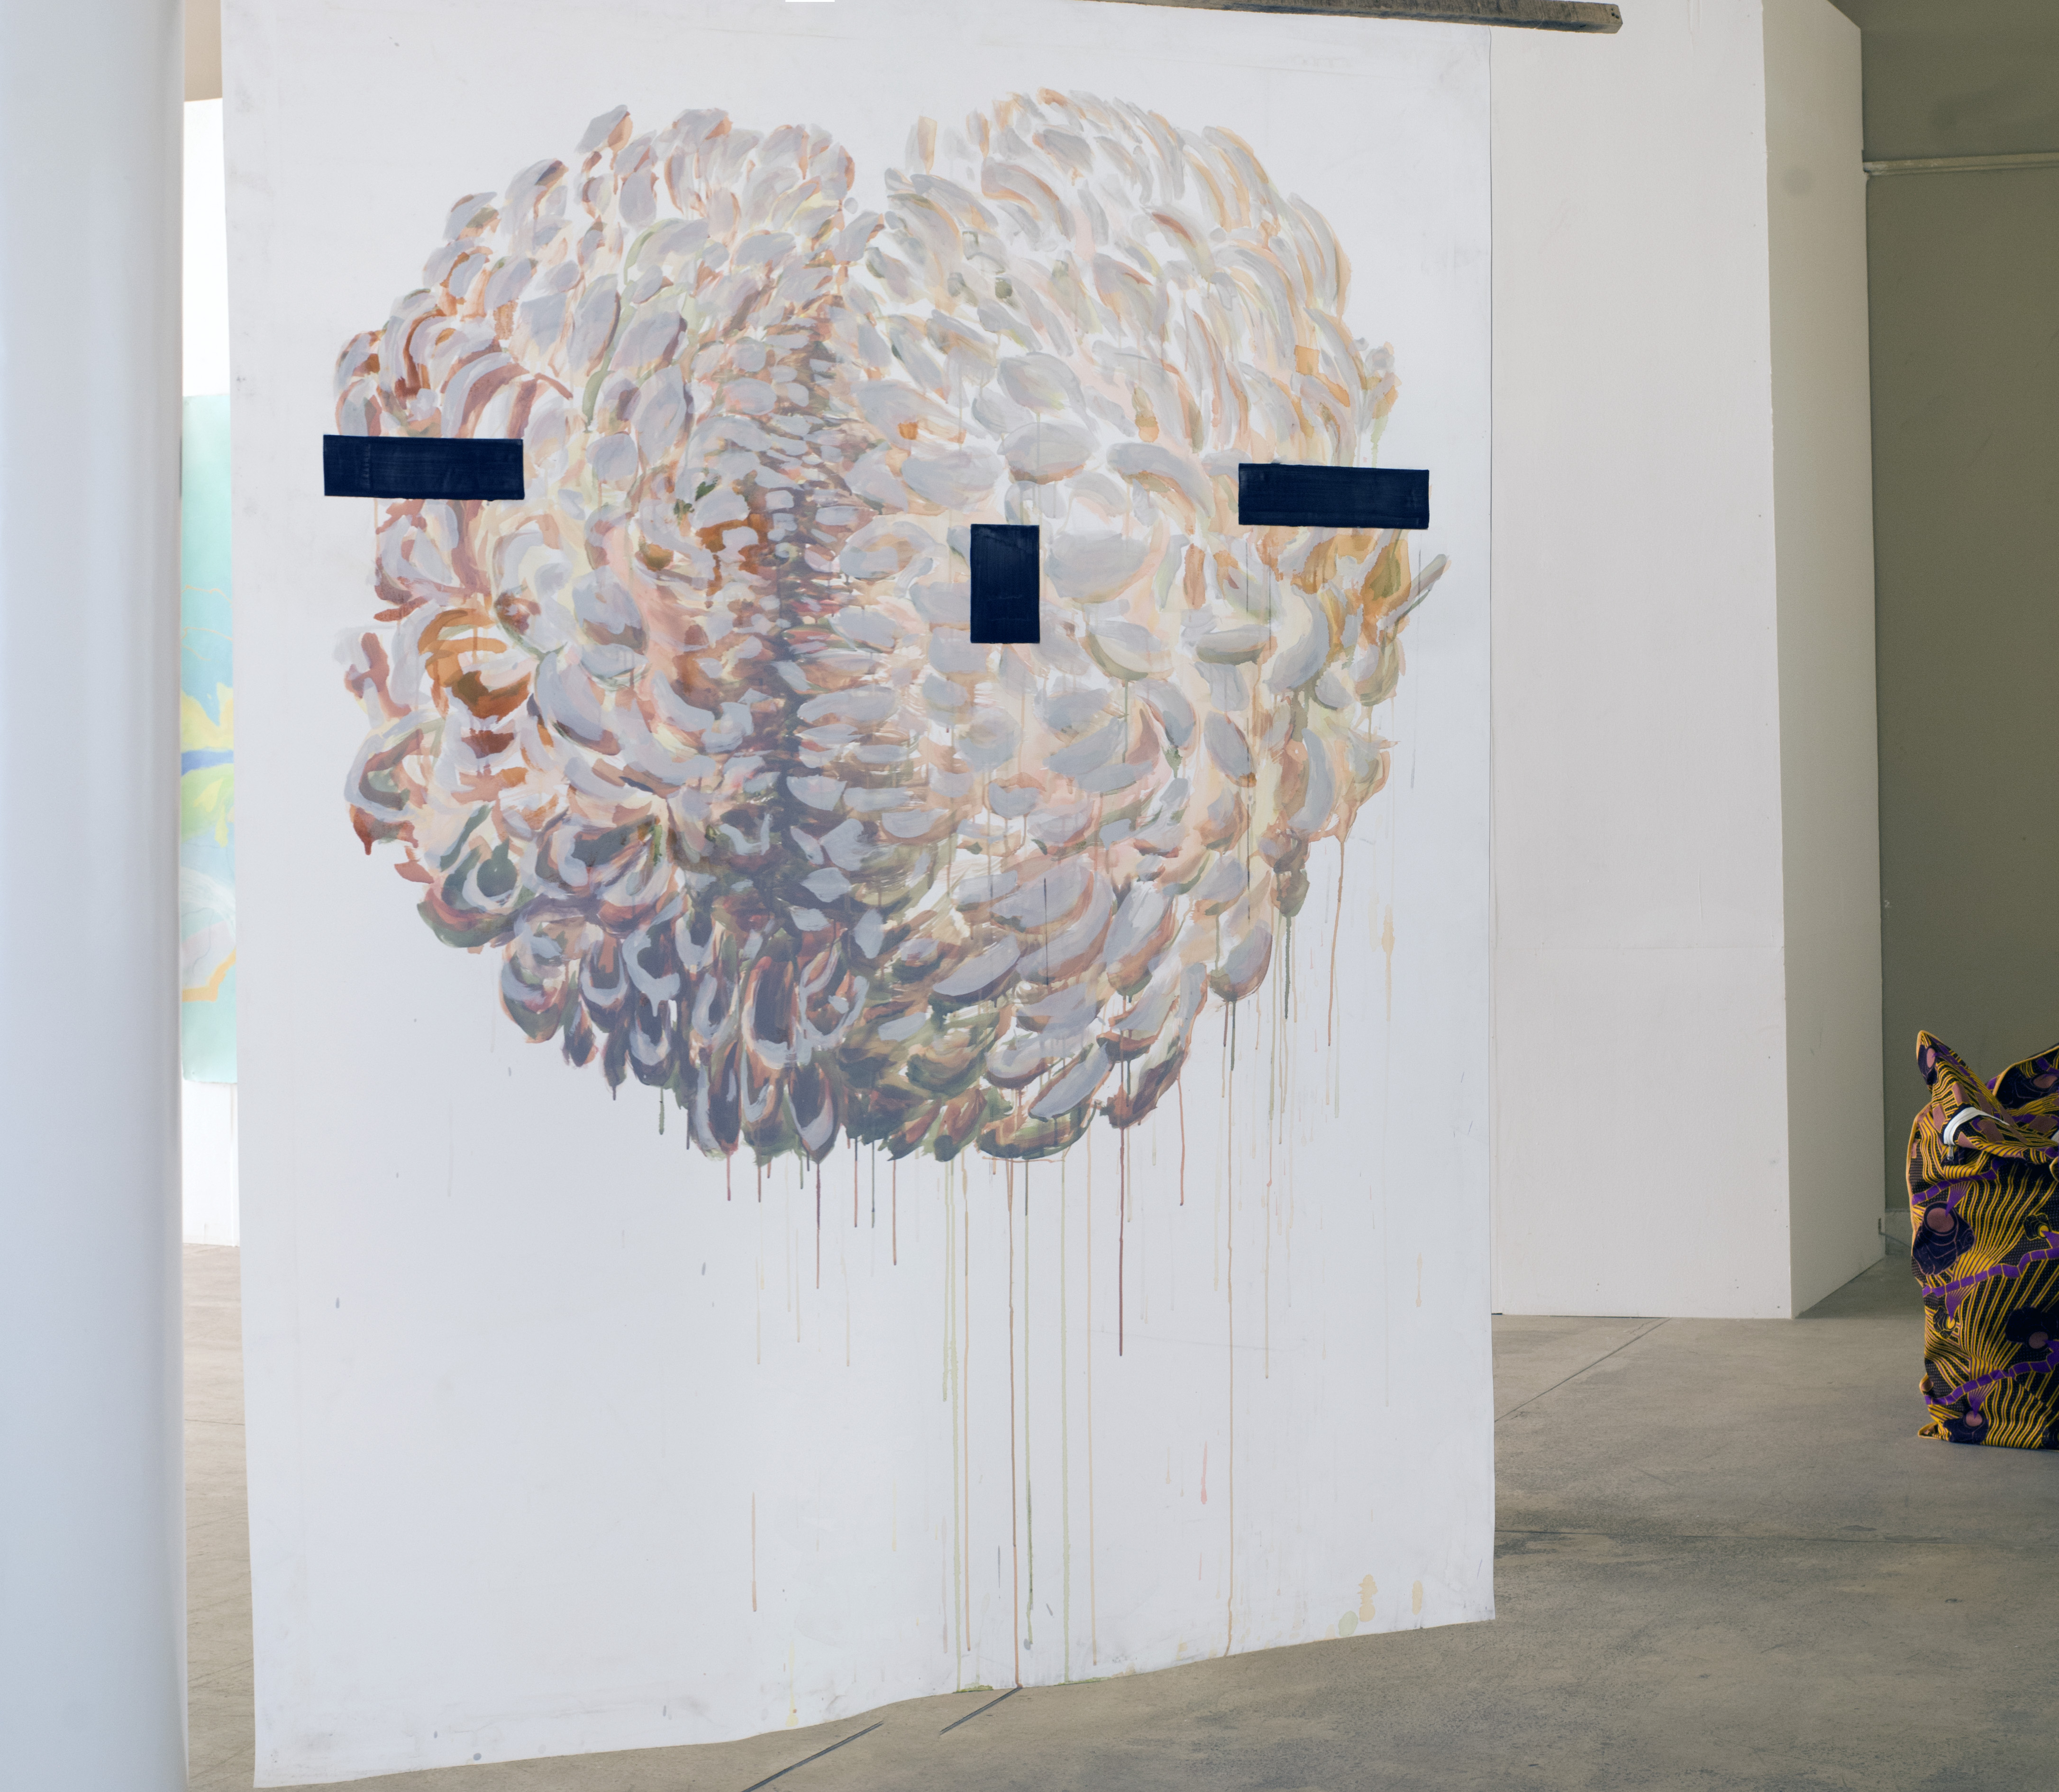 "Installation view: Martin Gustavsson, ""Un Chant Ecarlate"", 2018, from the  exhibition ""The Blue Hour"", Dak'Art biennale 2018. Photo: Karem Ibrahim"